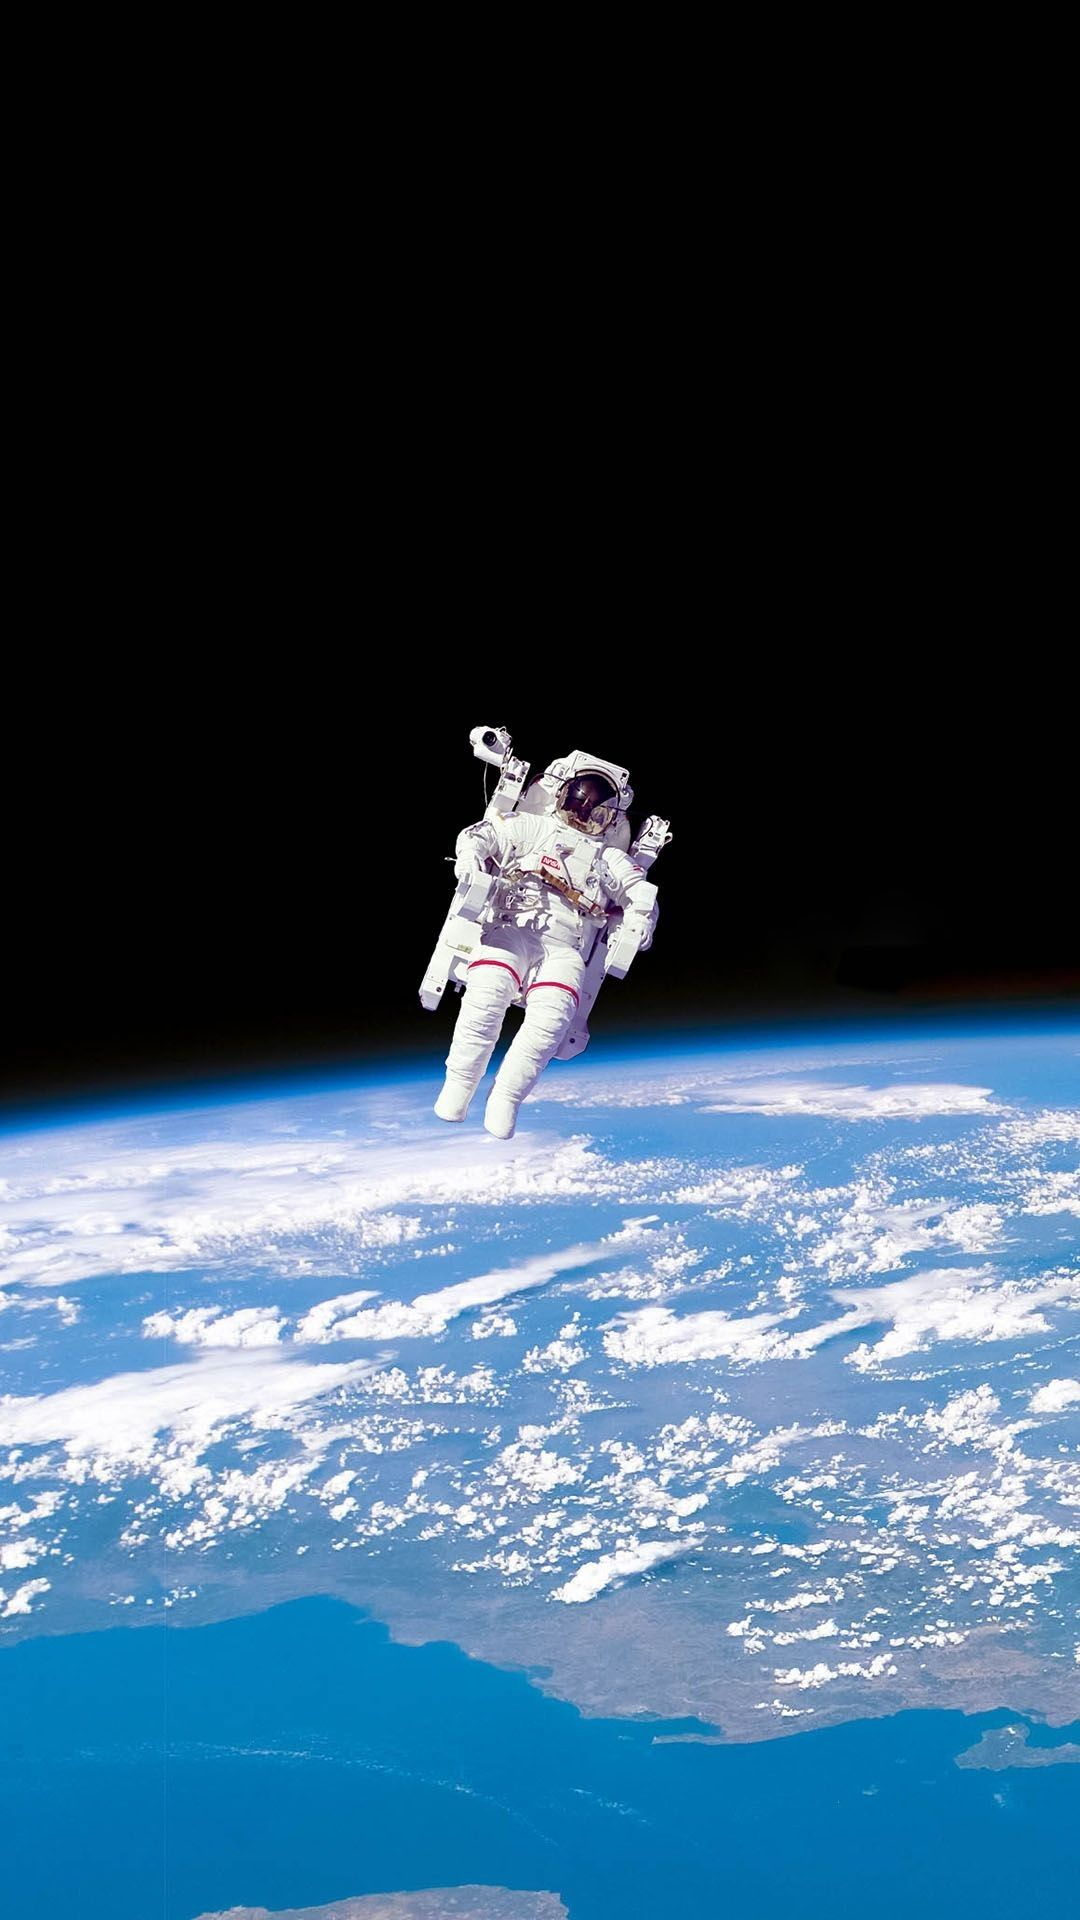 Awesome Astronaut Wallpaper Astronaut Wallpaper Nasa Wallpaper Free Live Wallpapers